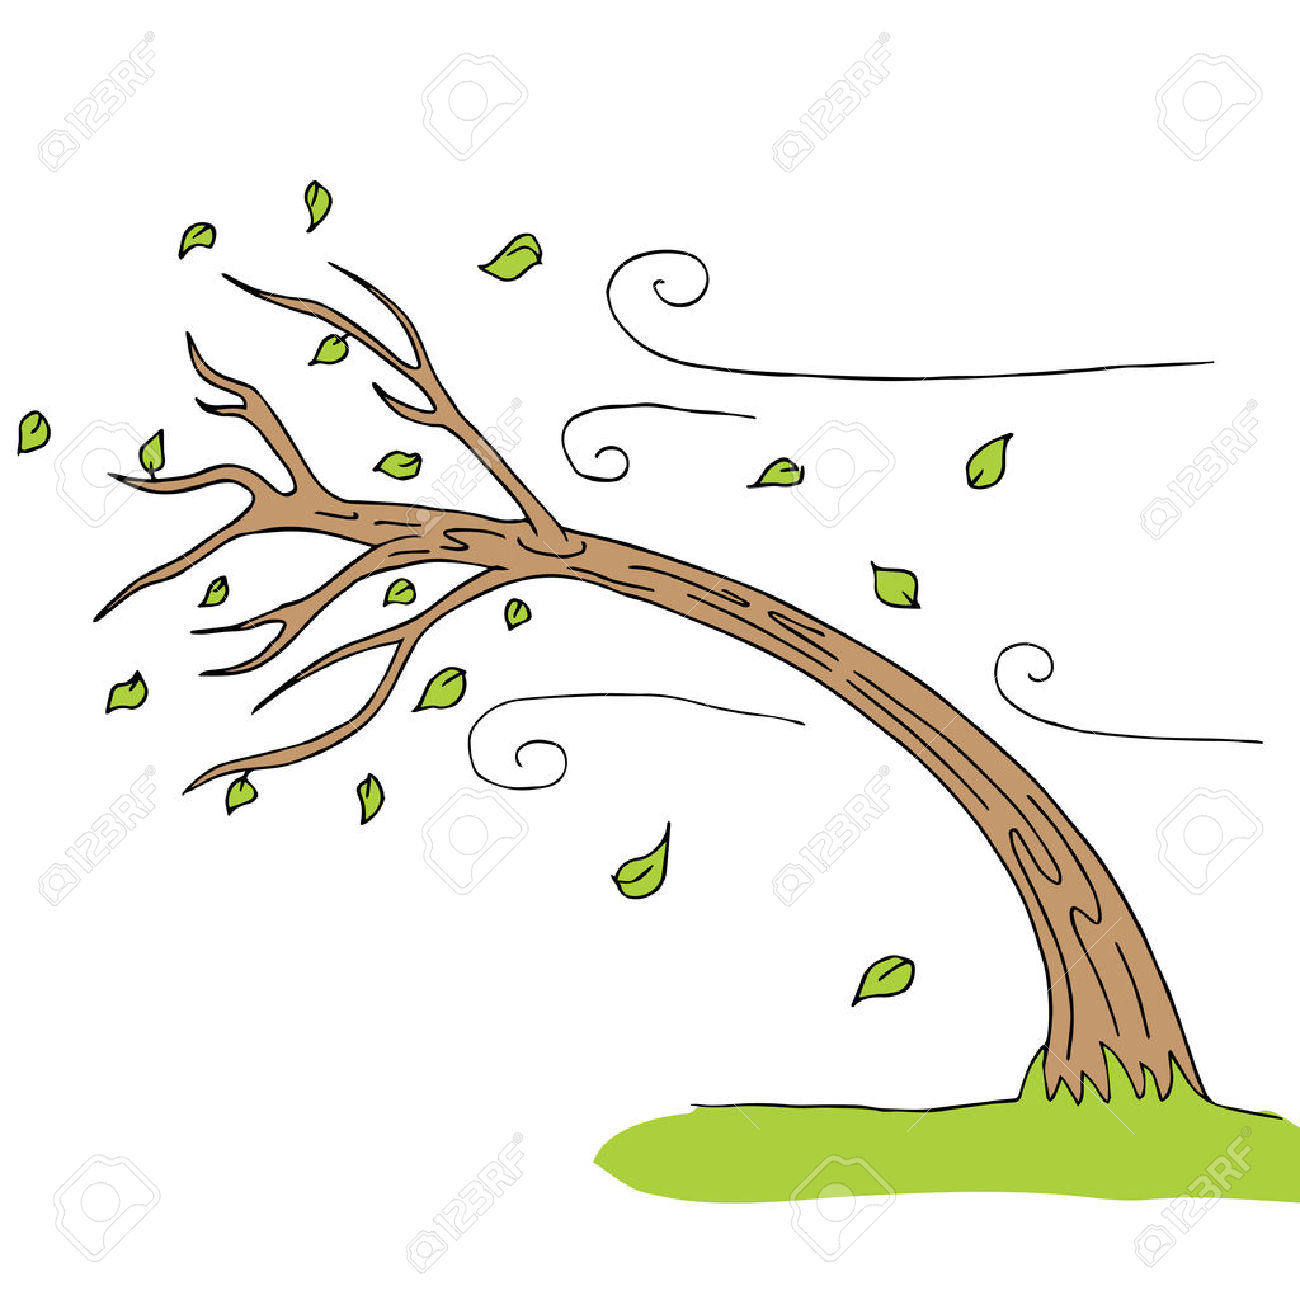 Breeze clipart windy season #3